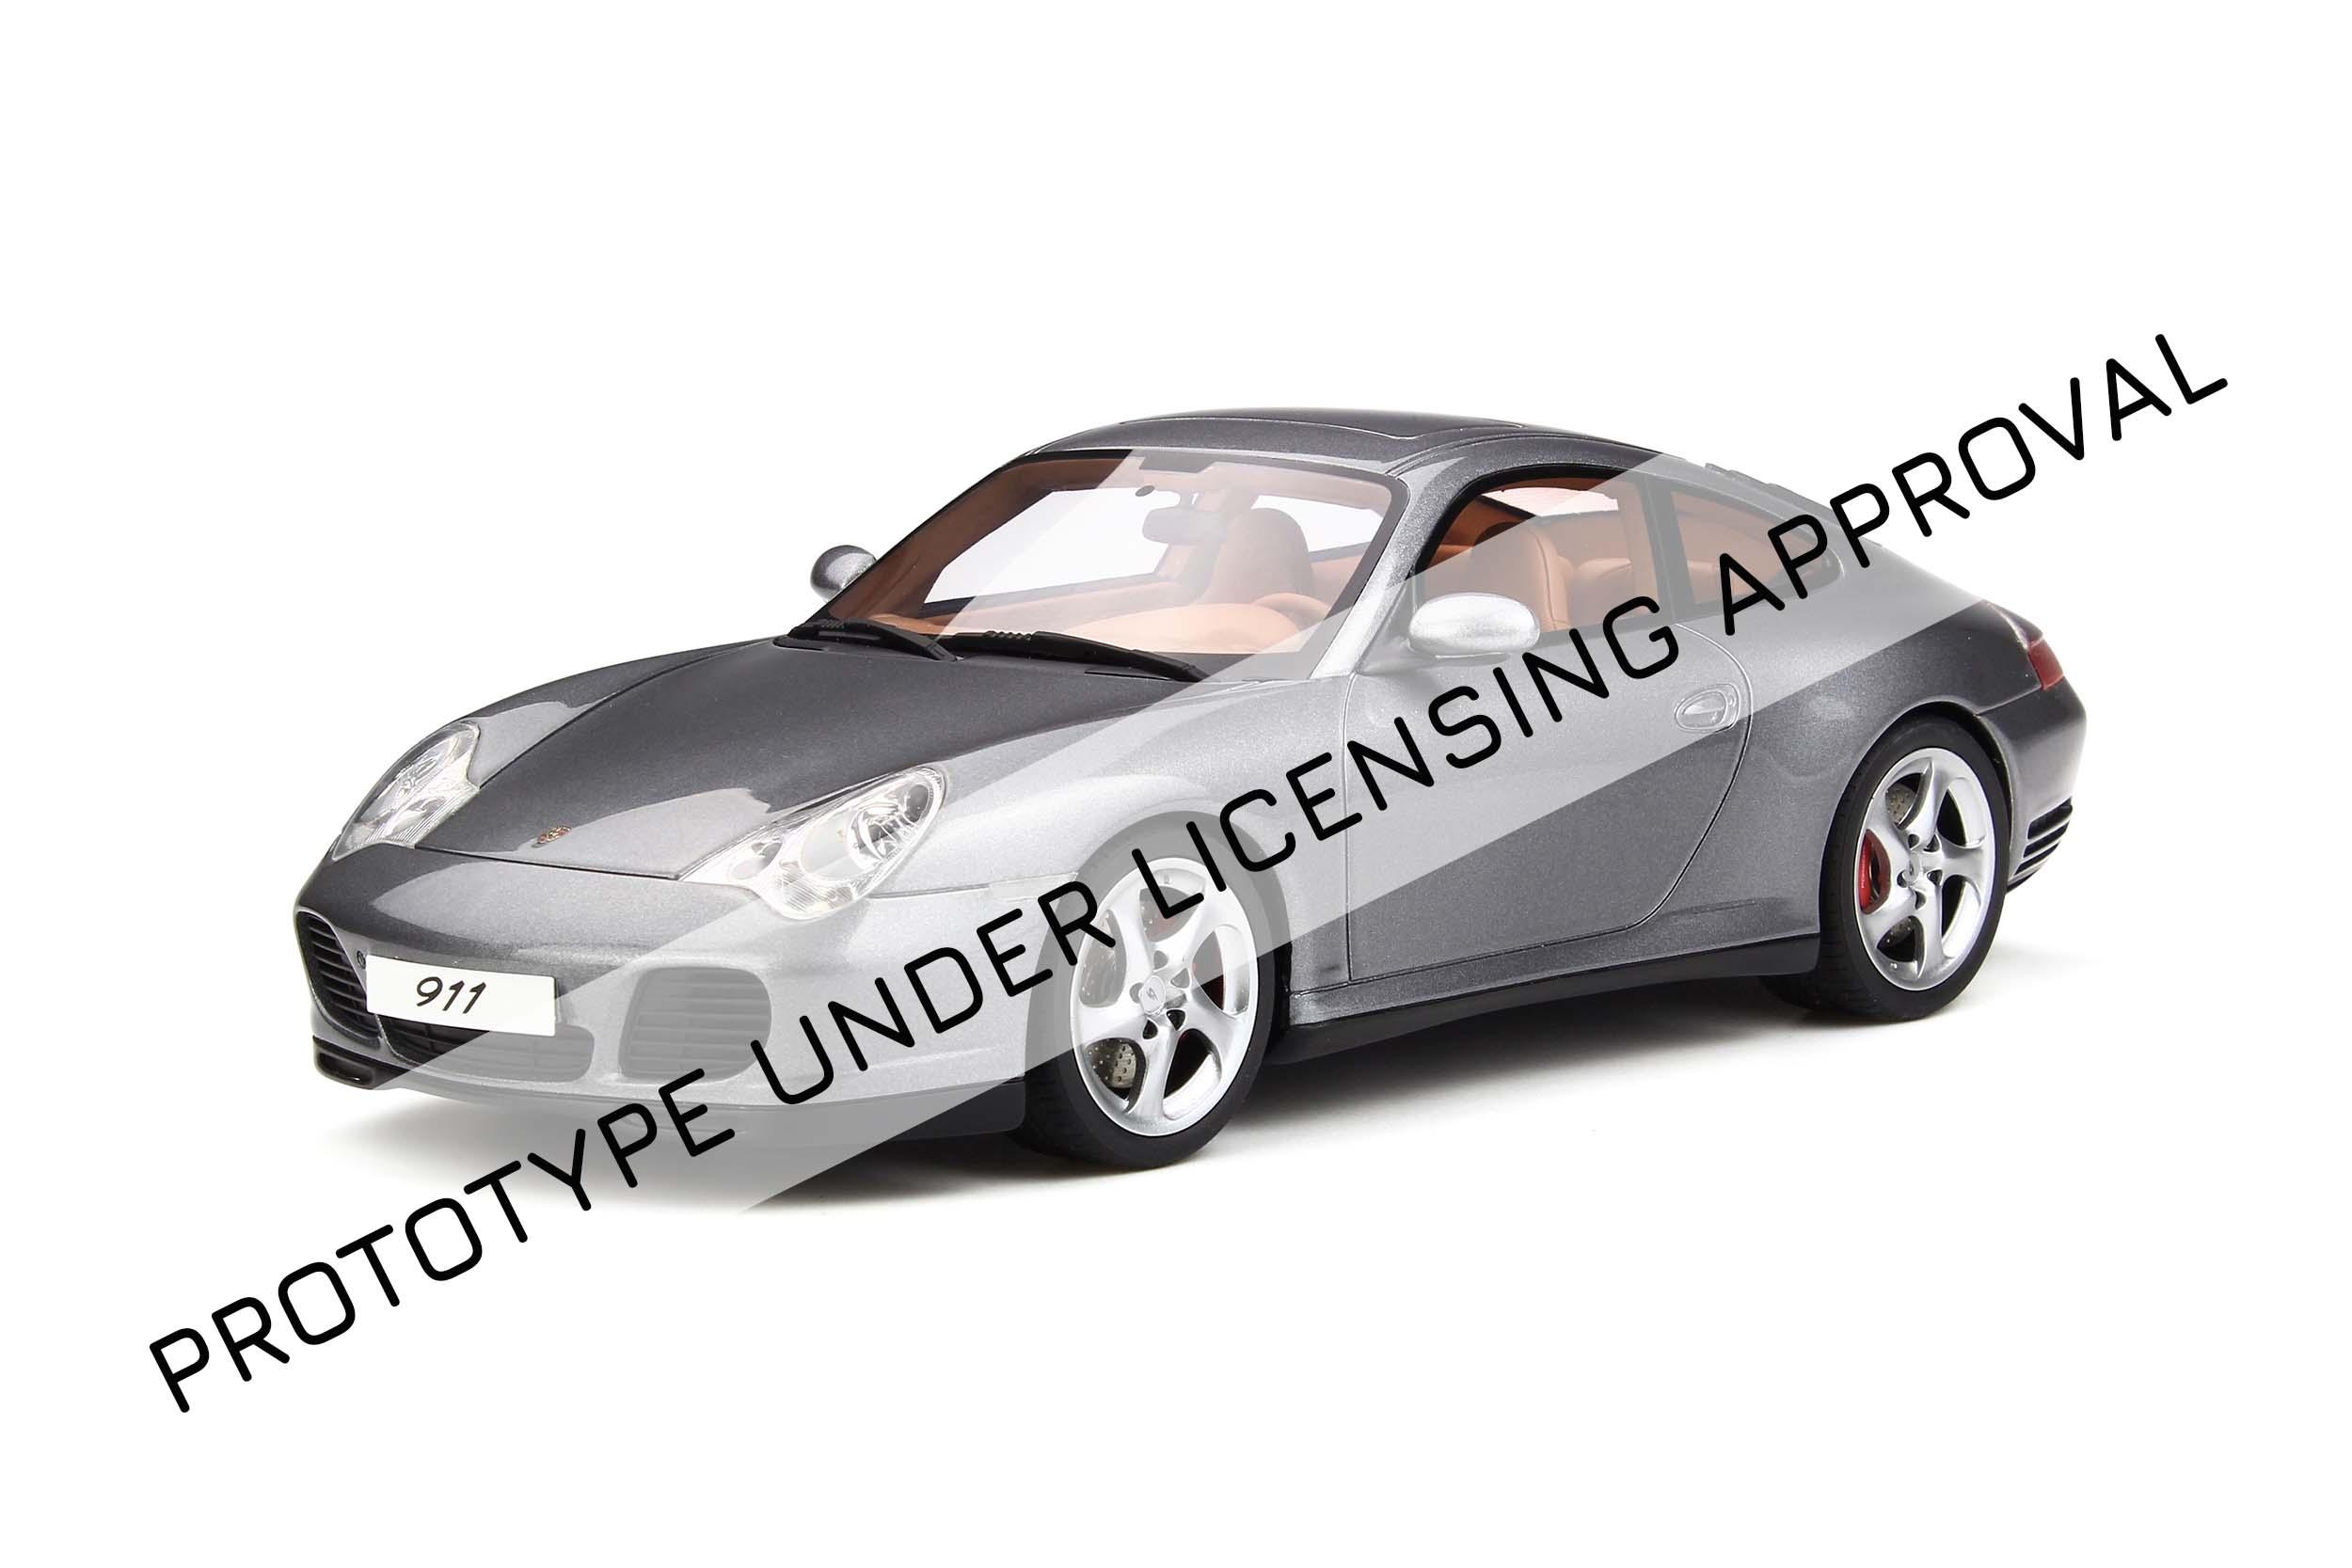 Porsche 911 996 Carrera 4s Model Car Collection Gt Spirit